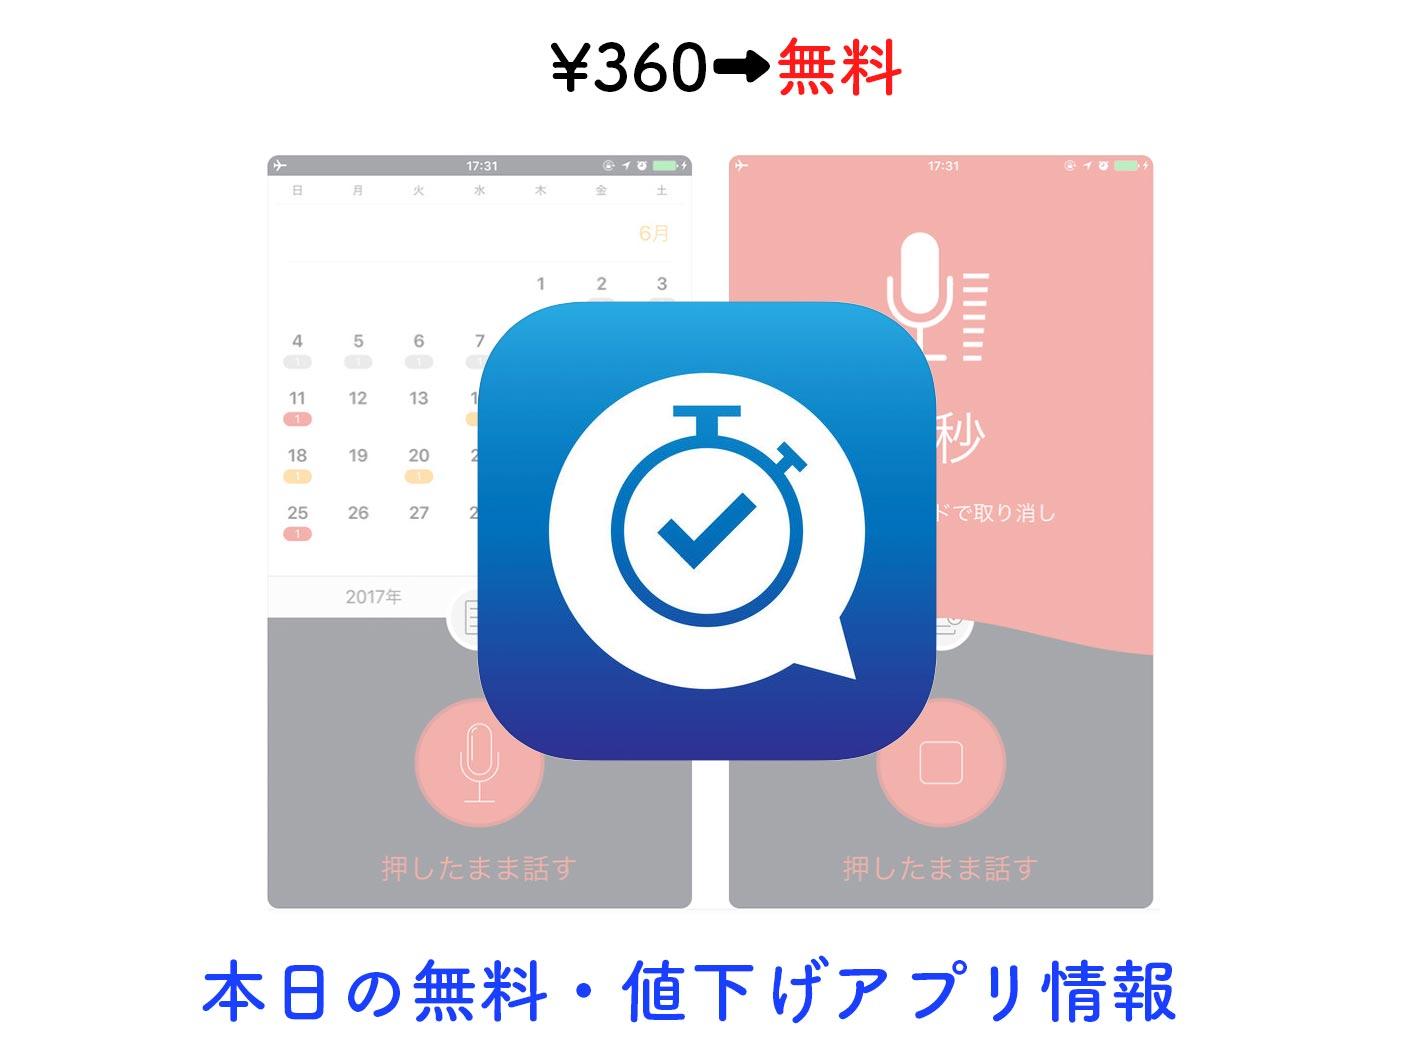 Appsale0616